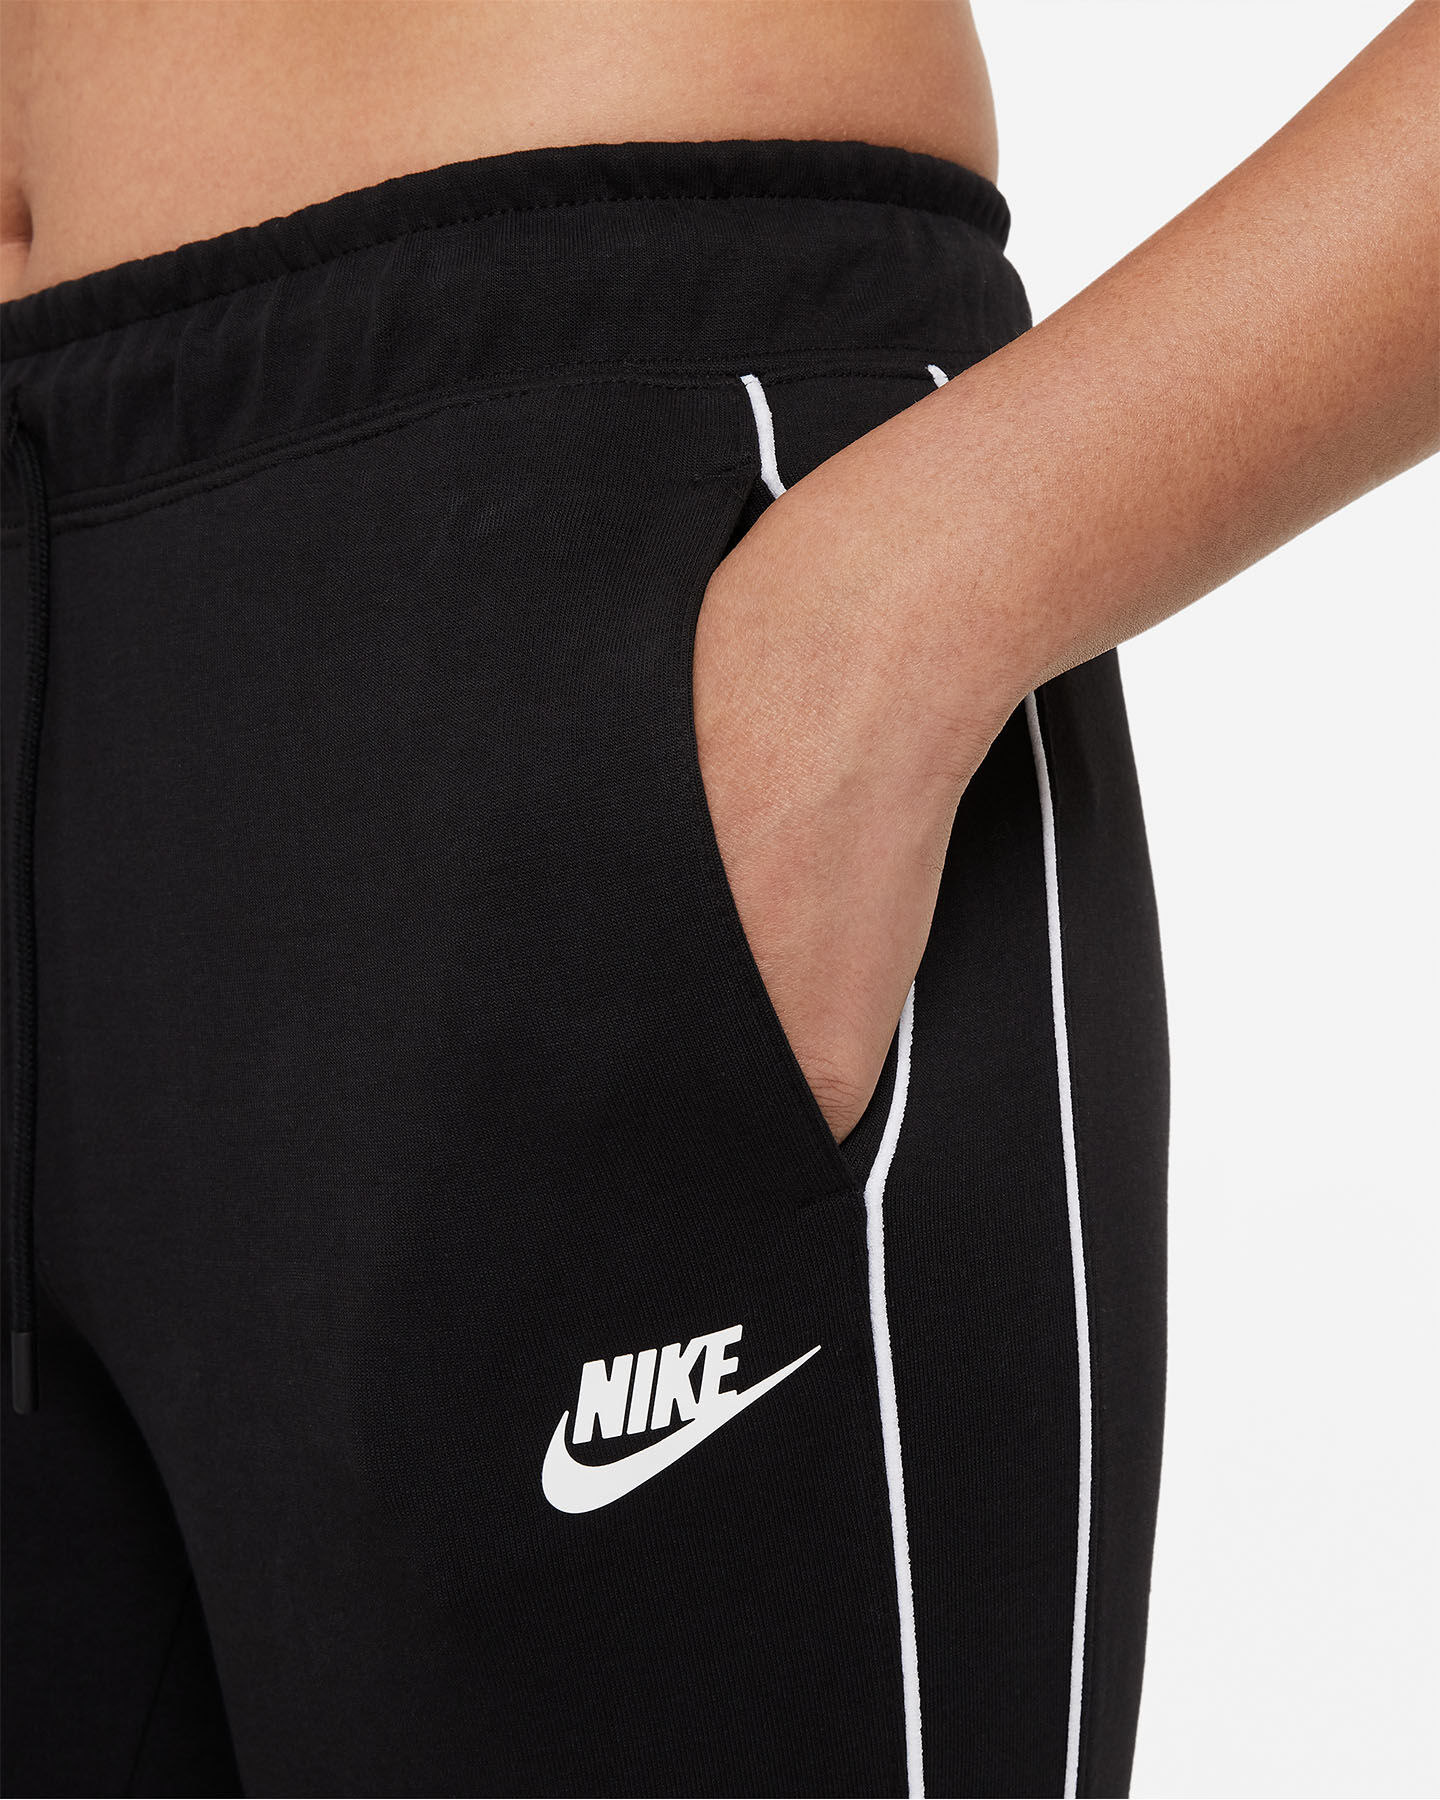 Pantalone NIKE DOUBLE W S5269767 scatto 4